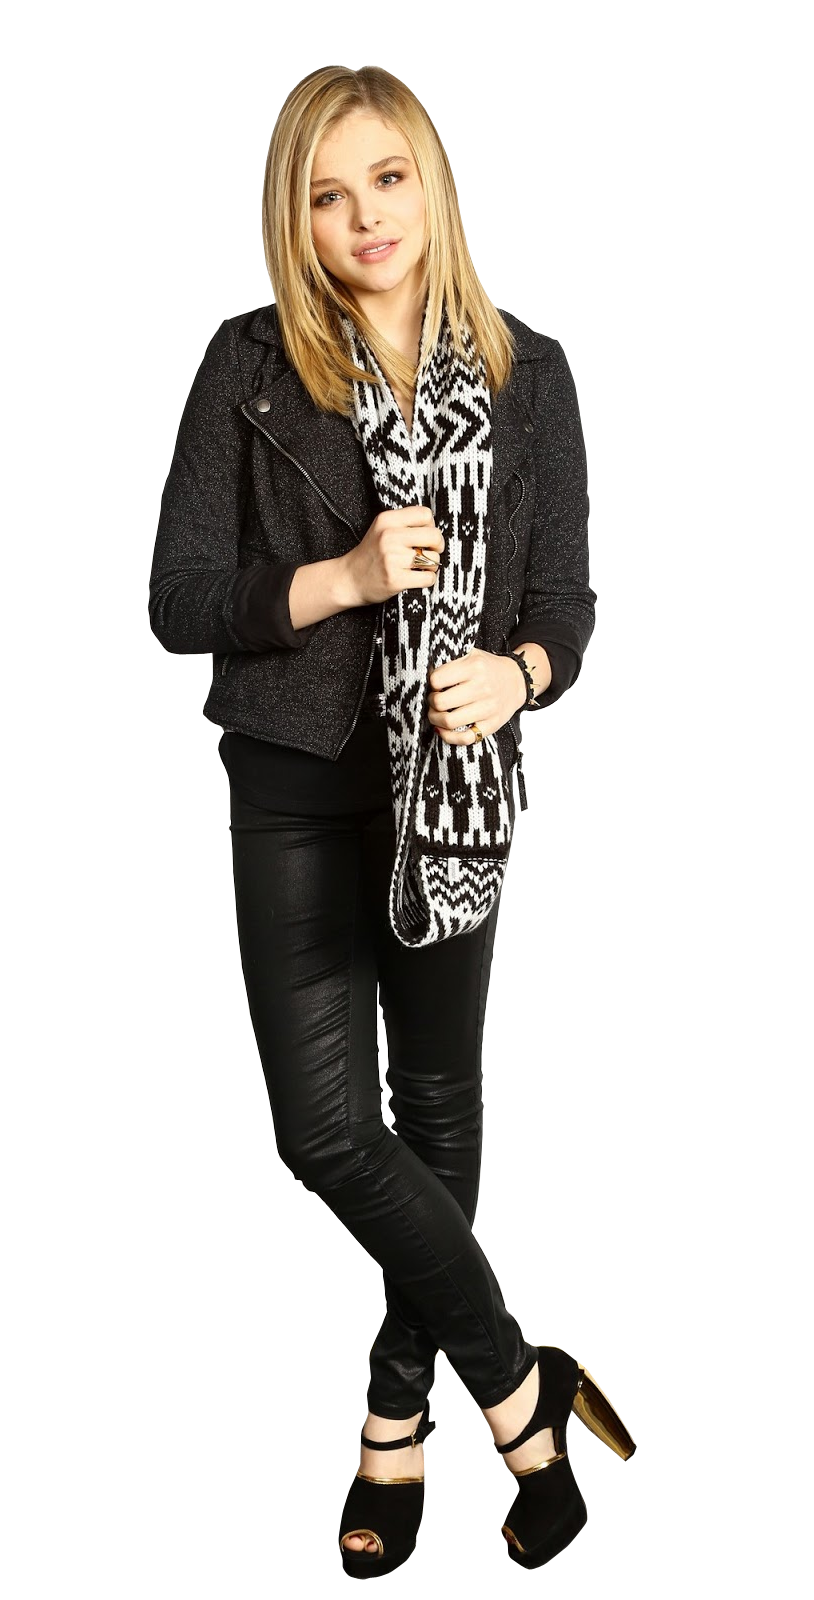 Chloe Grace Moretz PNG Pic